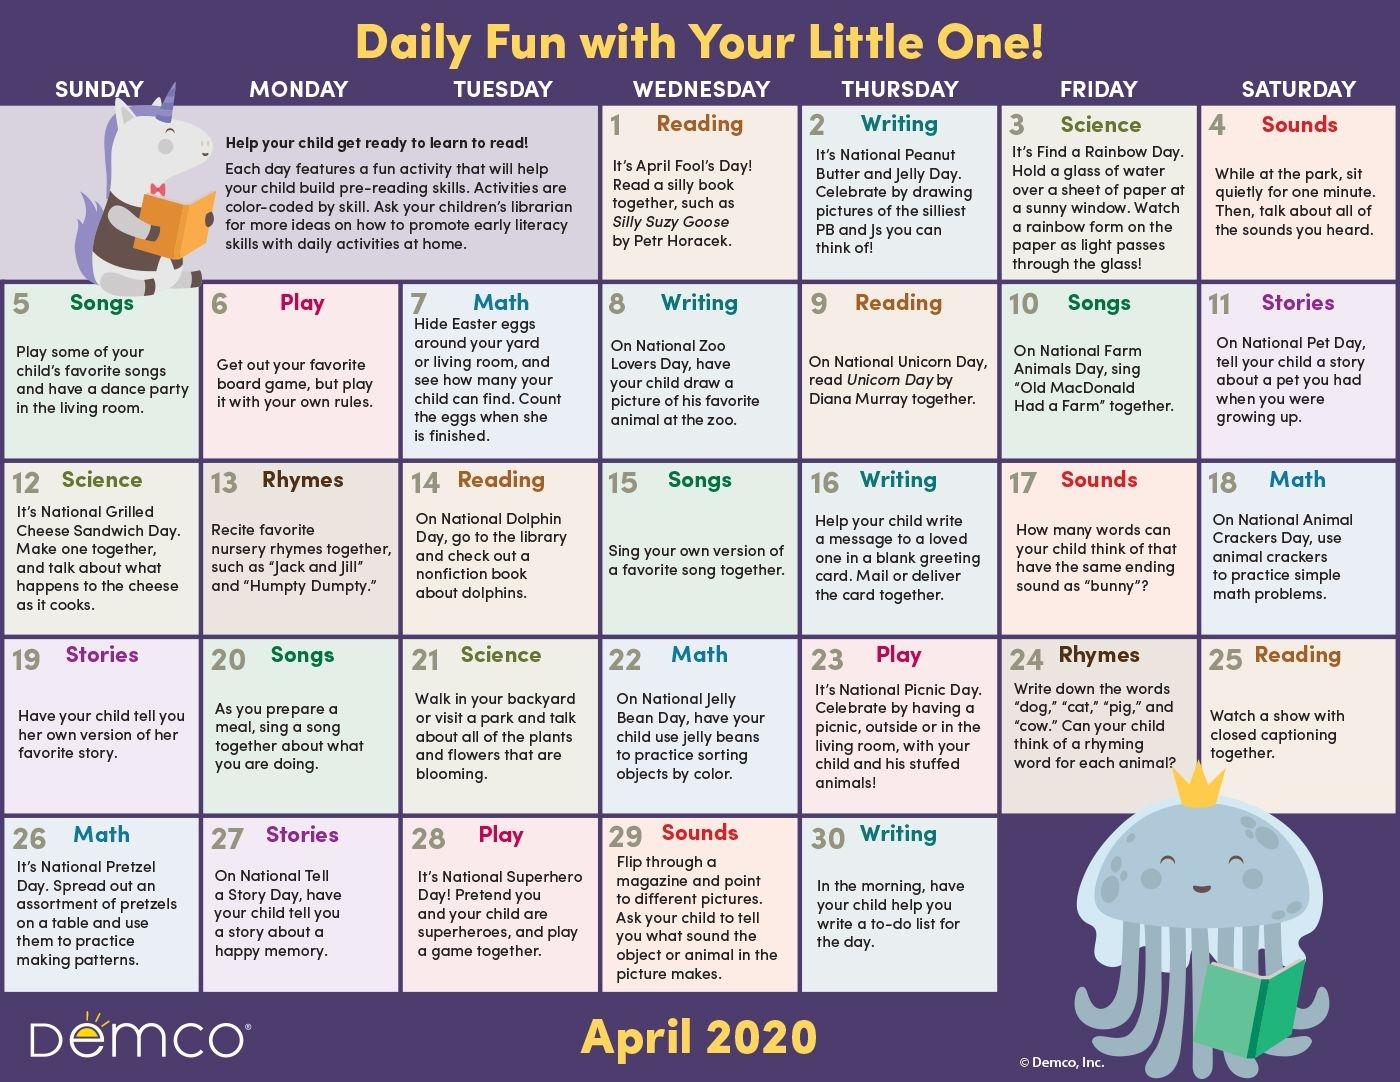 Early Literacy Activities Calendar: April 2020